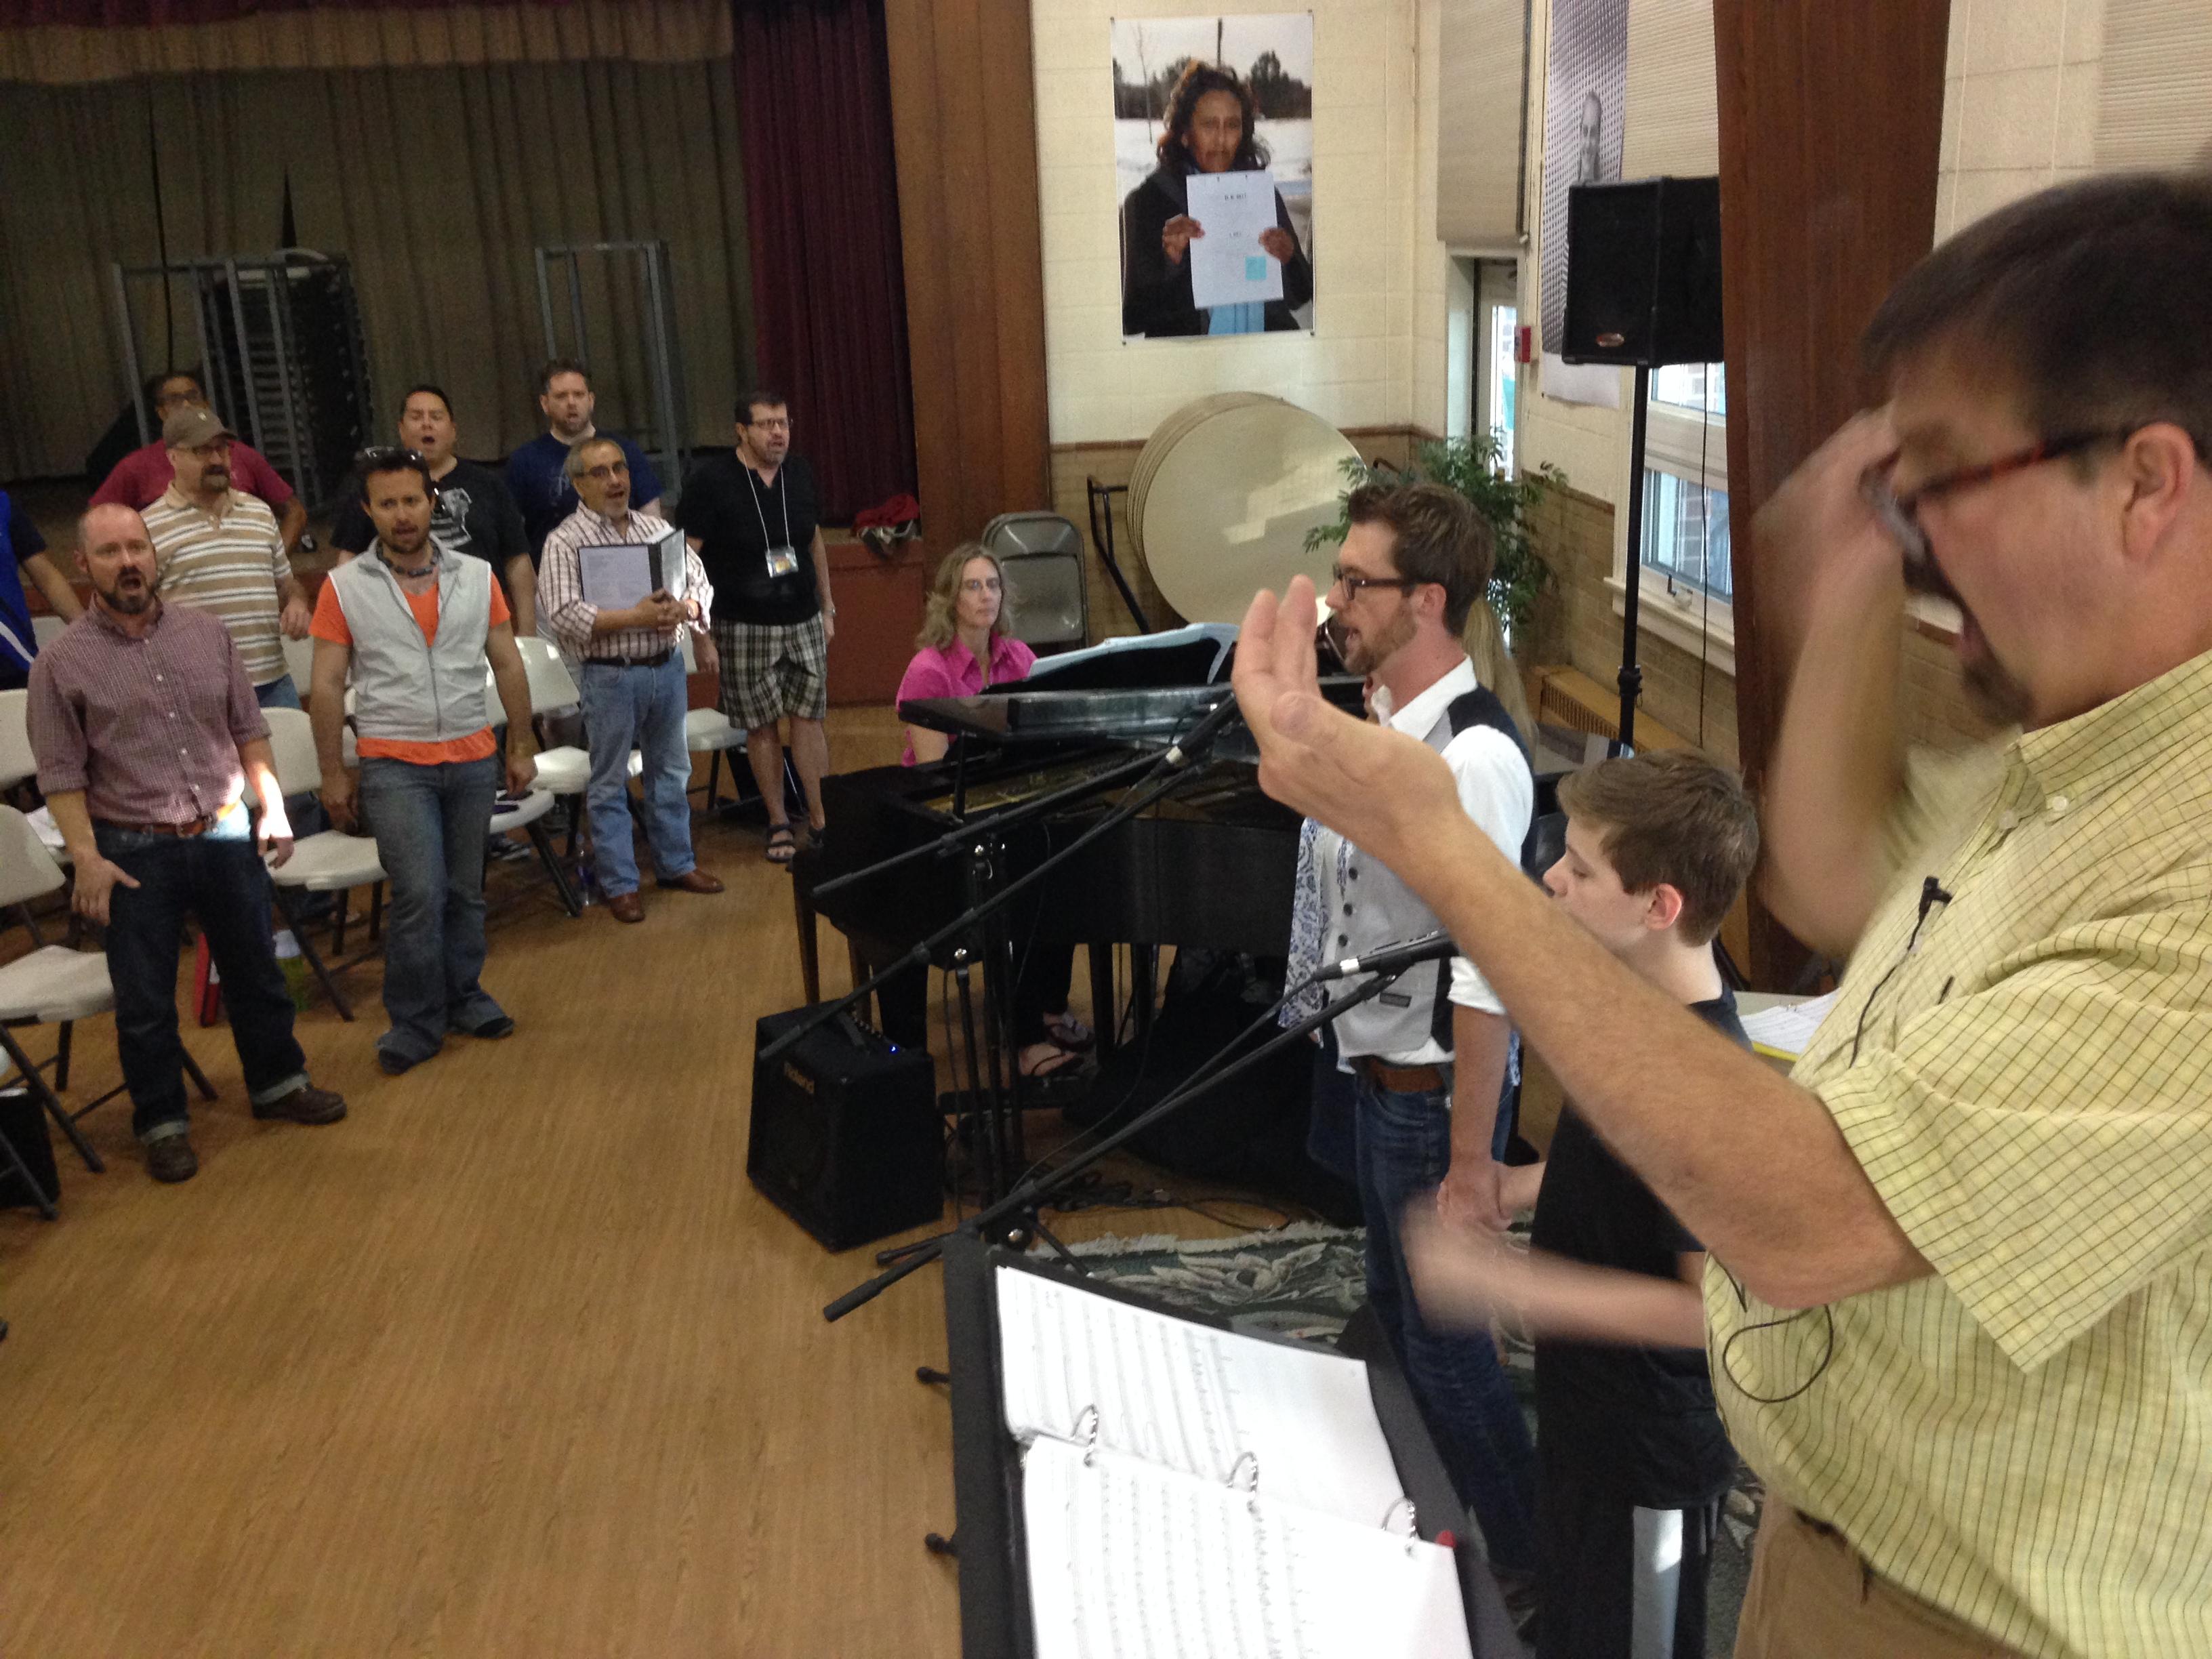 Photo: Denver Gay Men's Chorus rehearsal 2014